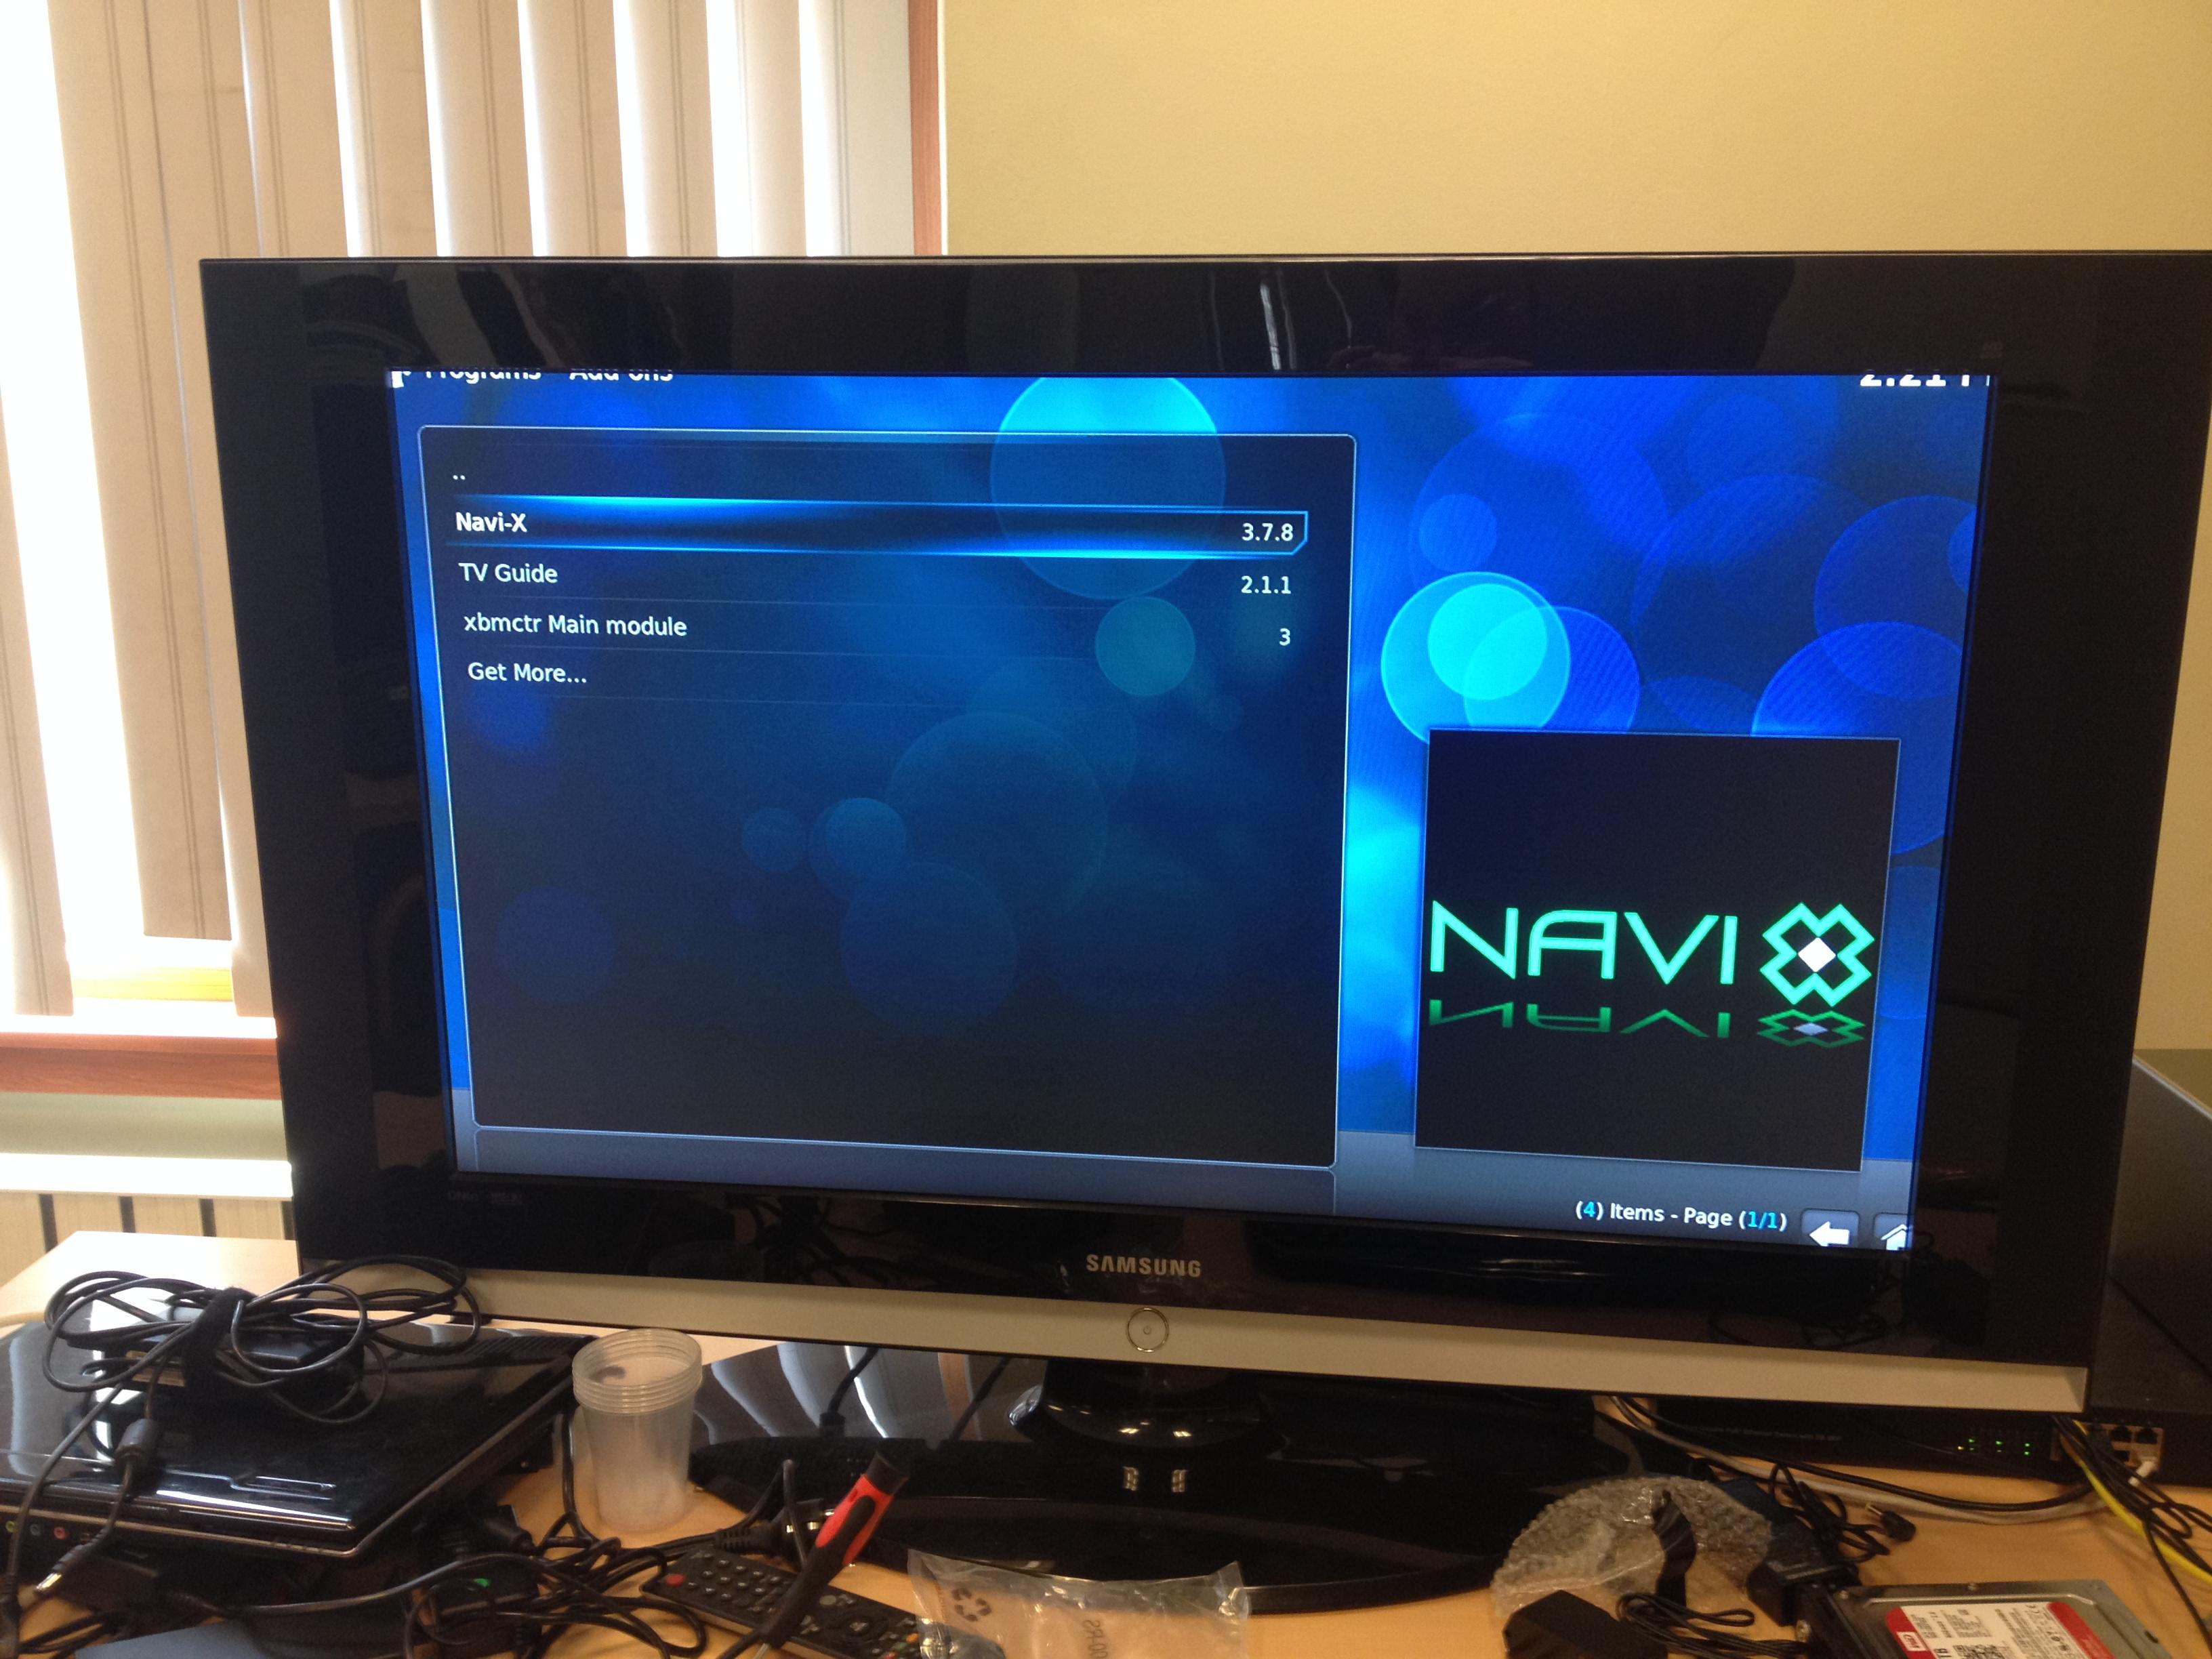 Qnap Navx Add-on (2)